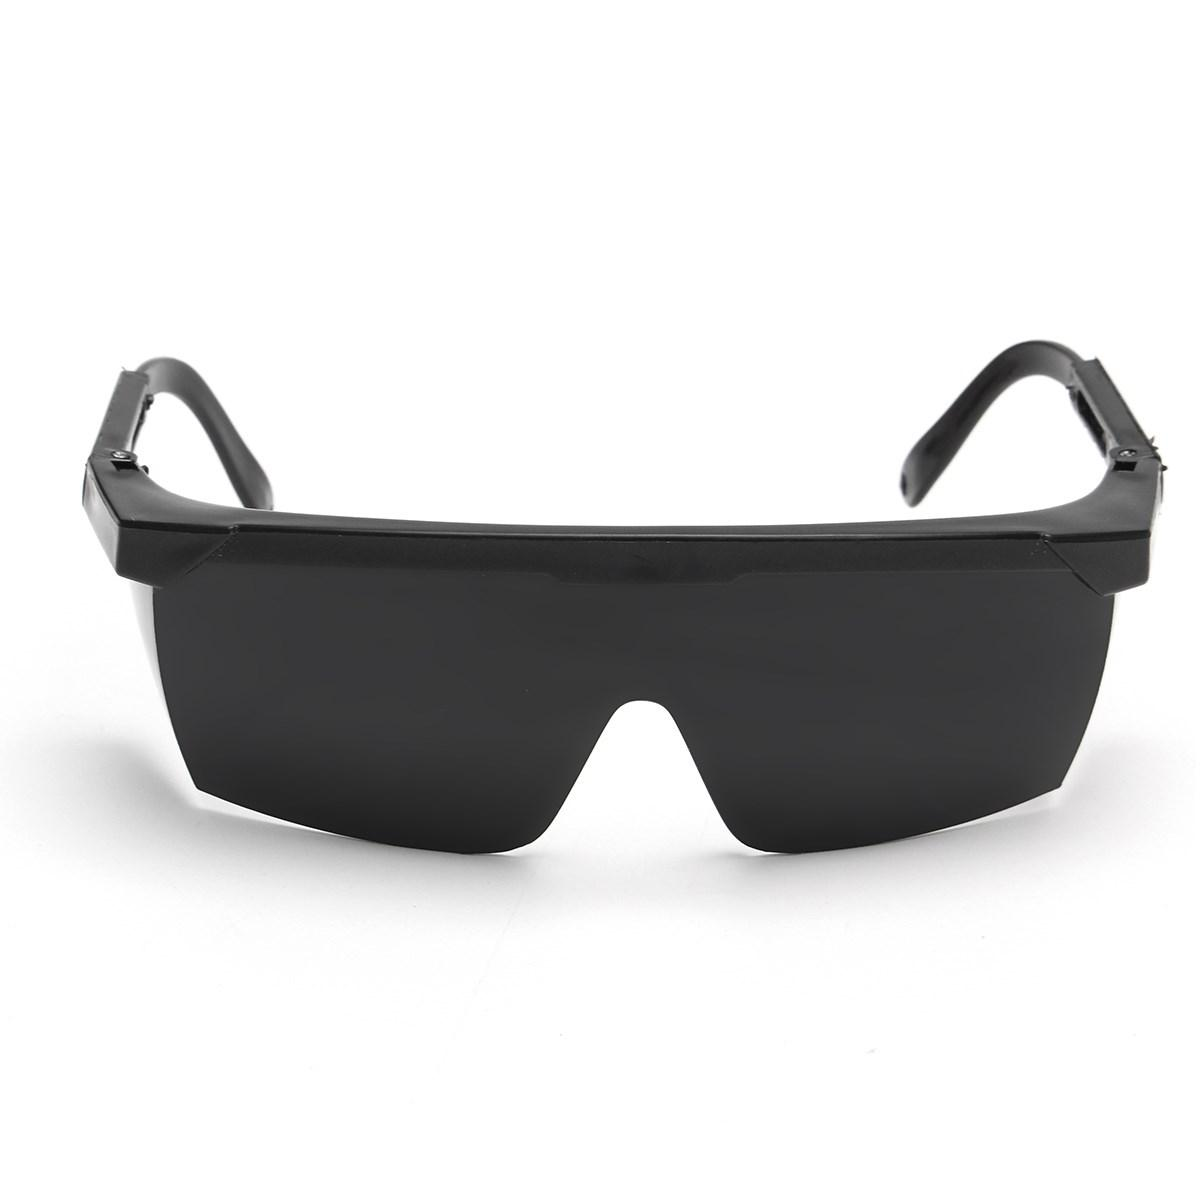 Super Promo Kacamata Las Teknik Kacamata Pelindung